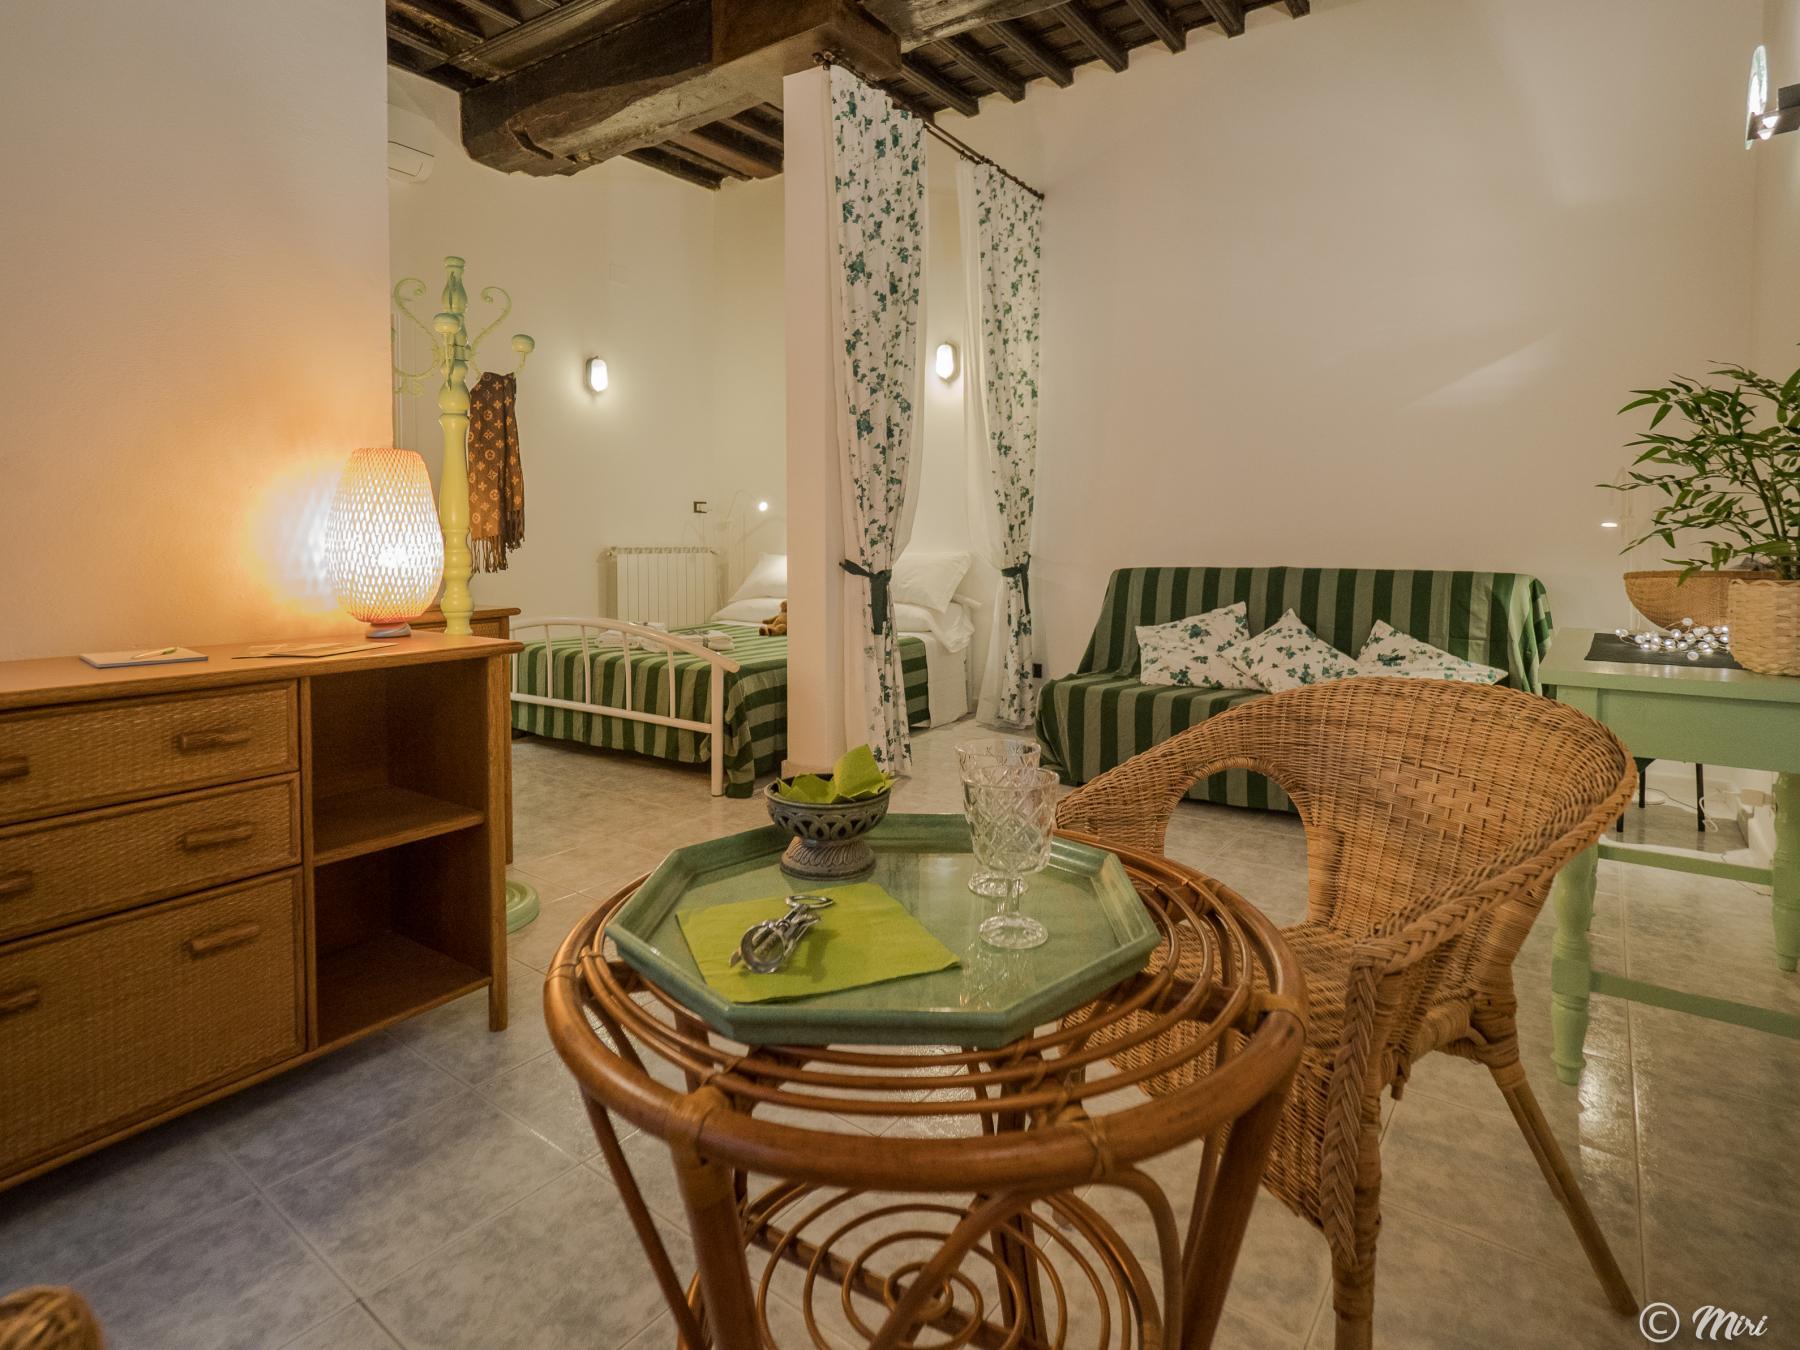 Bacin Der Caste' Apartment